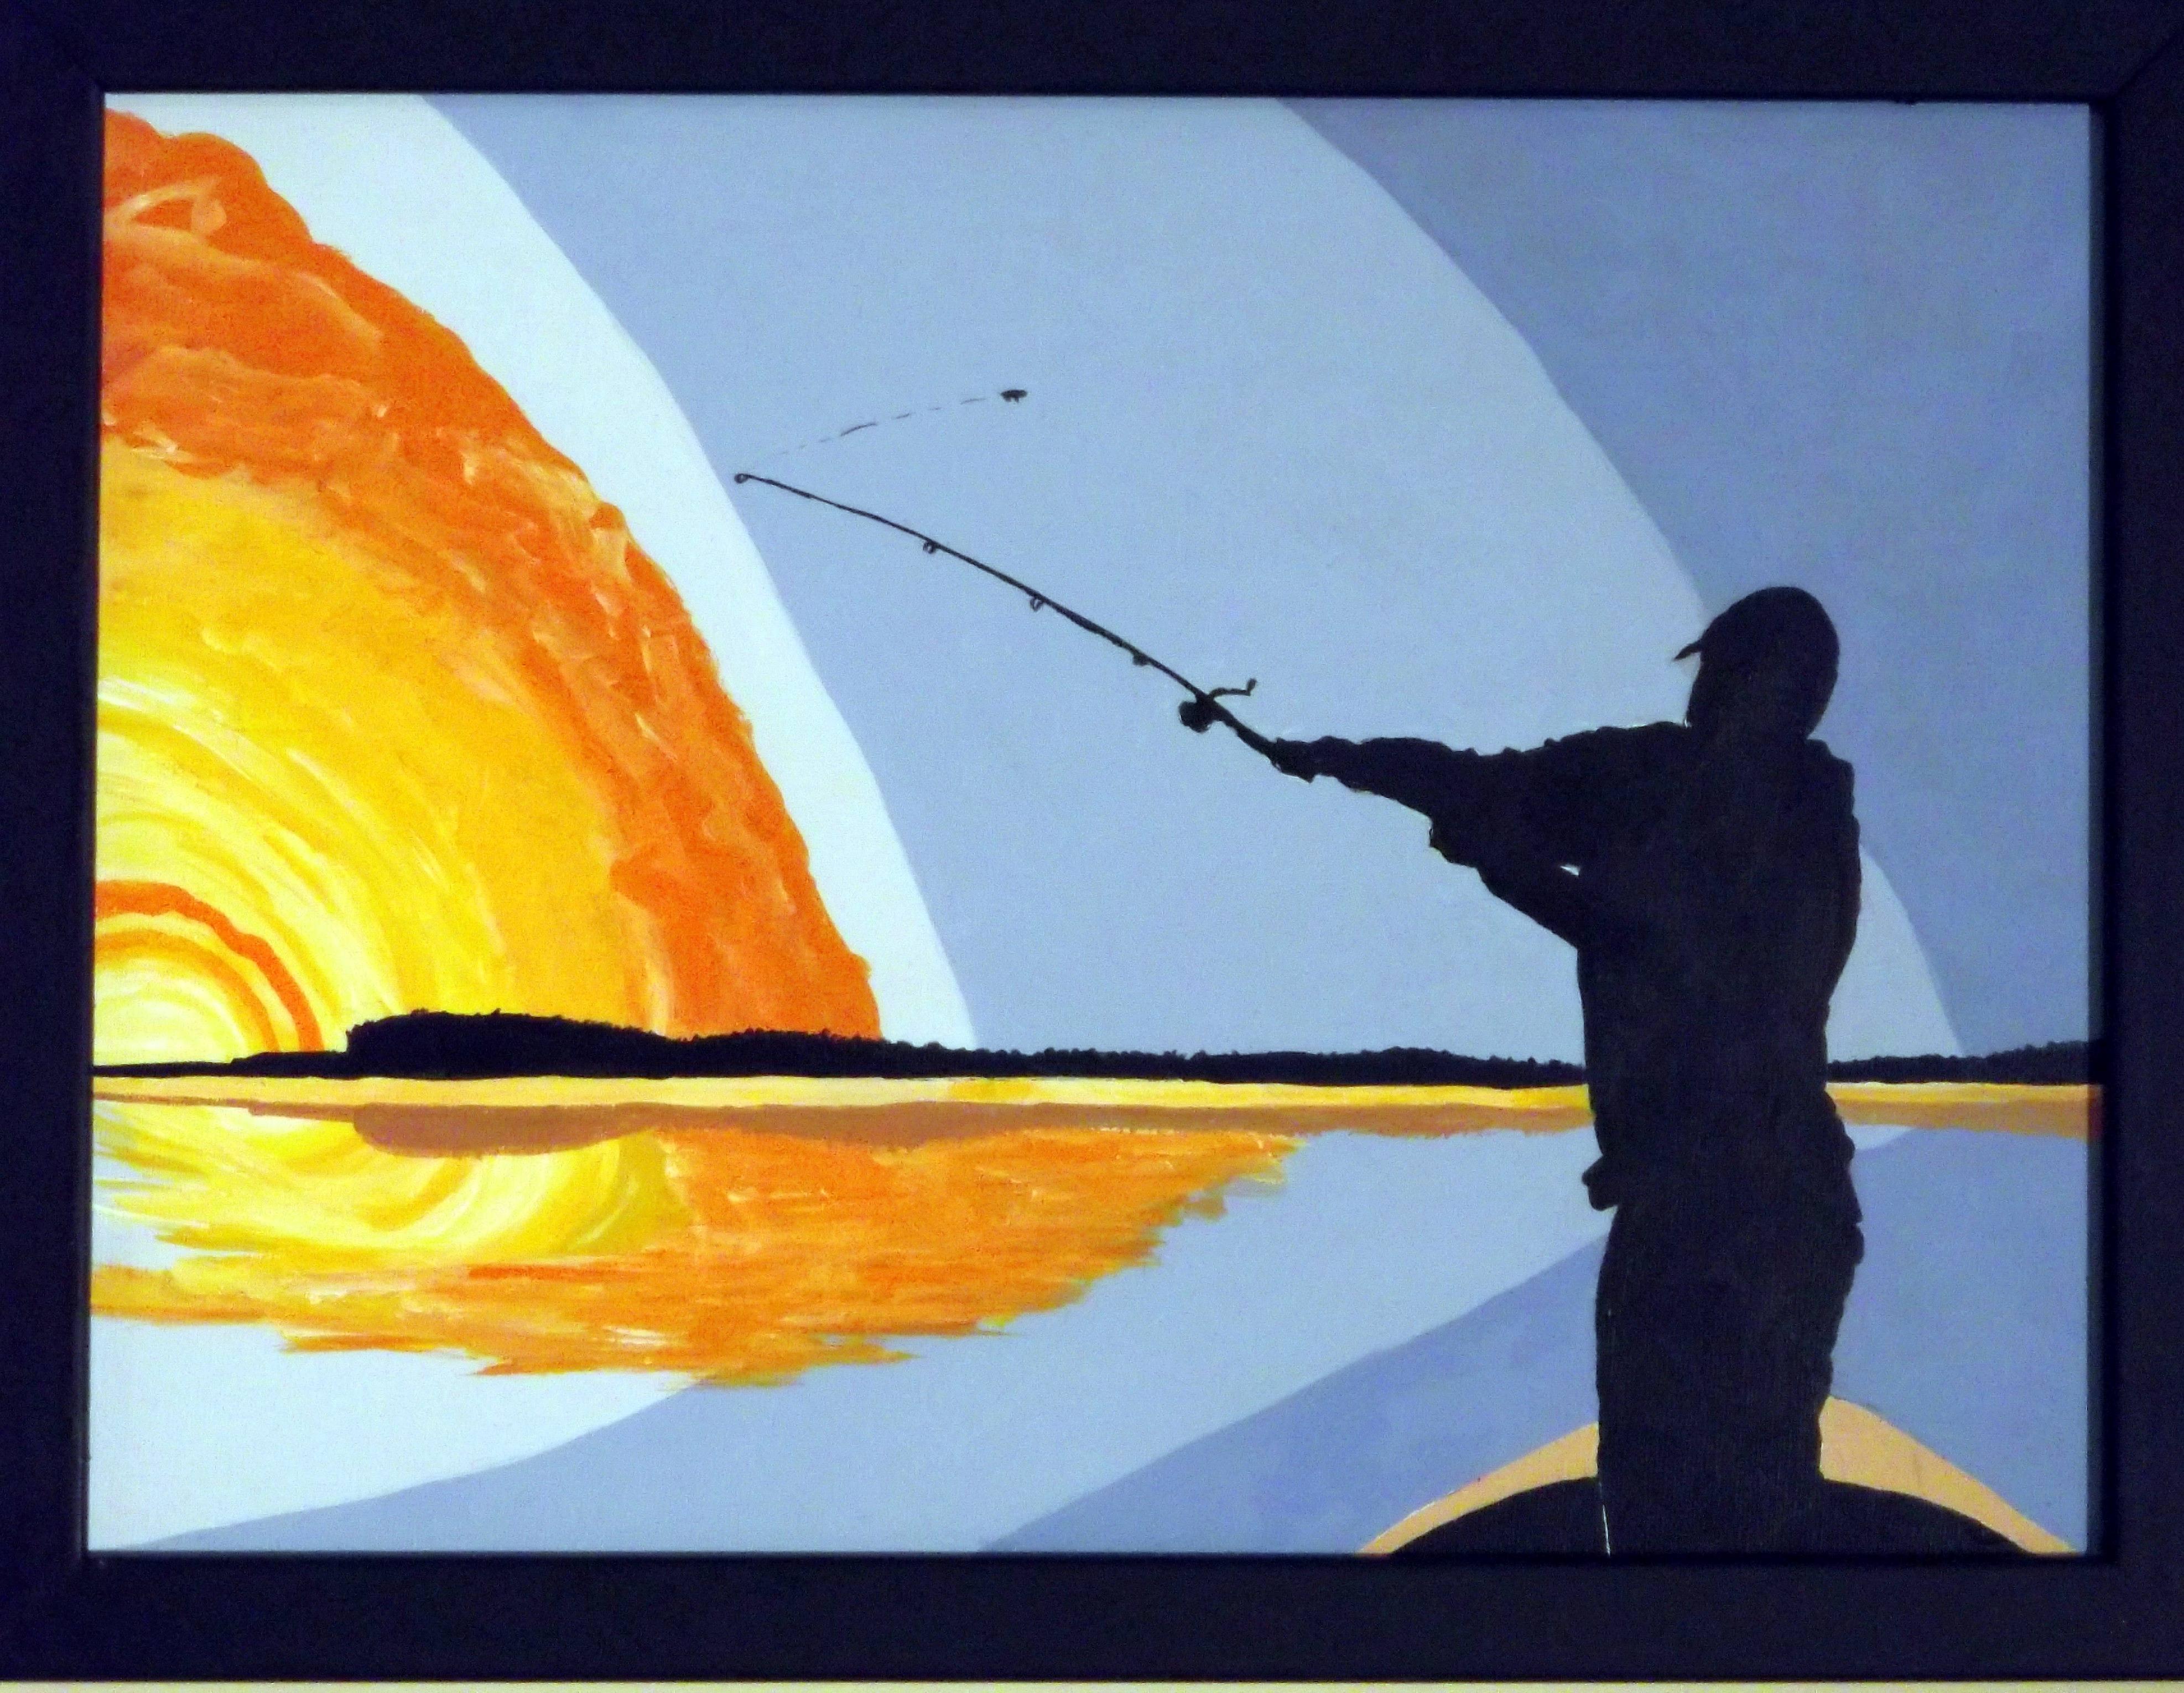 William Hedican – Inspiring Experimentation Through Art